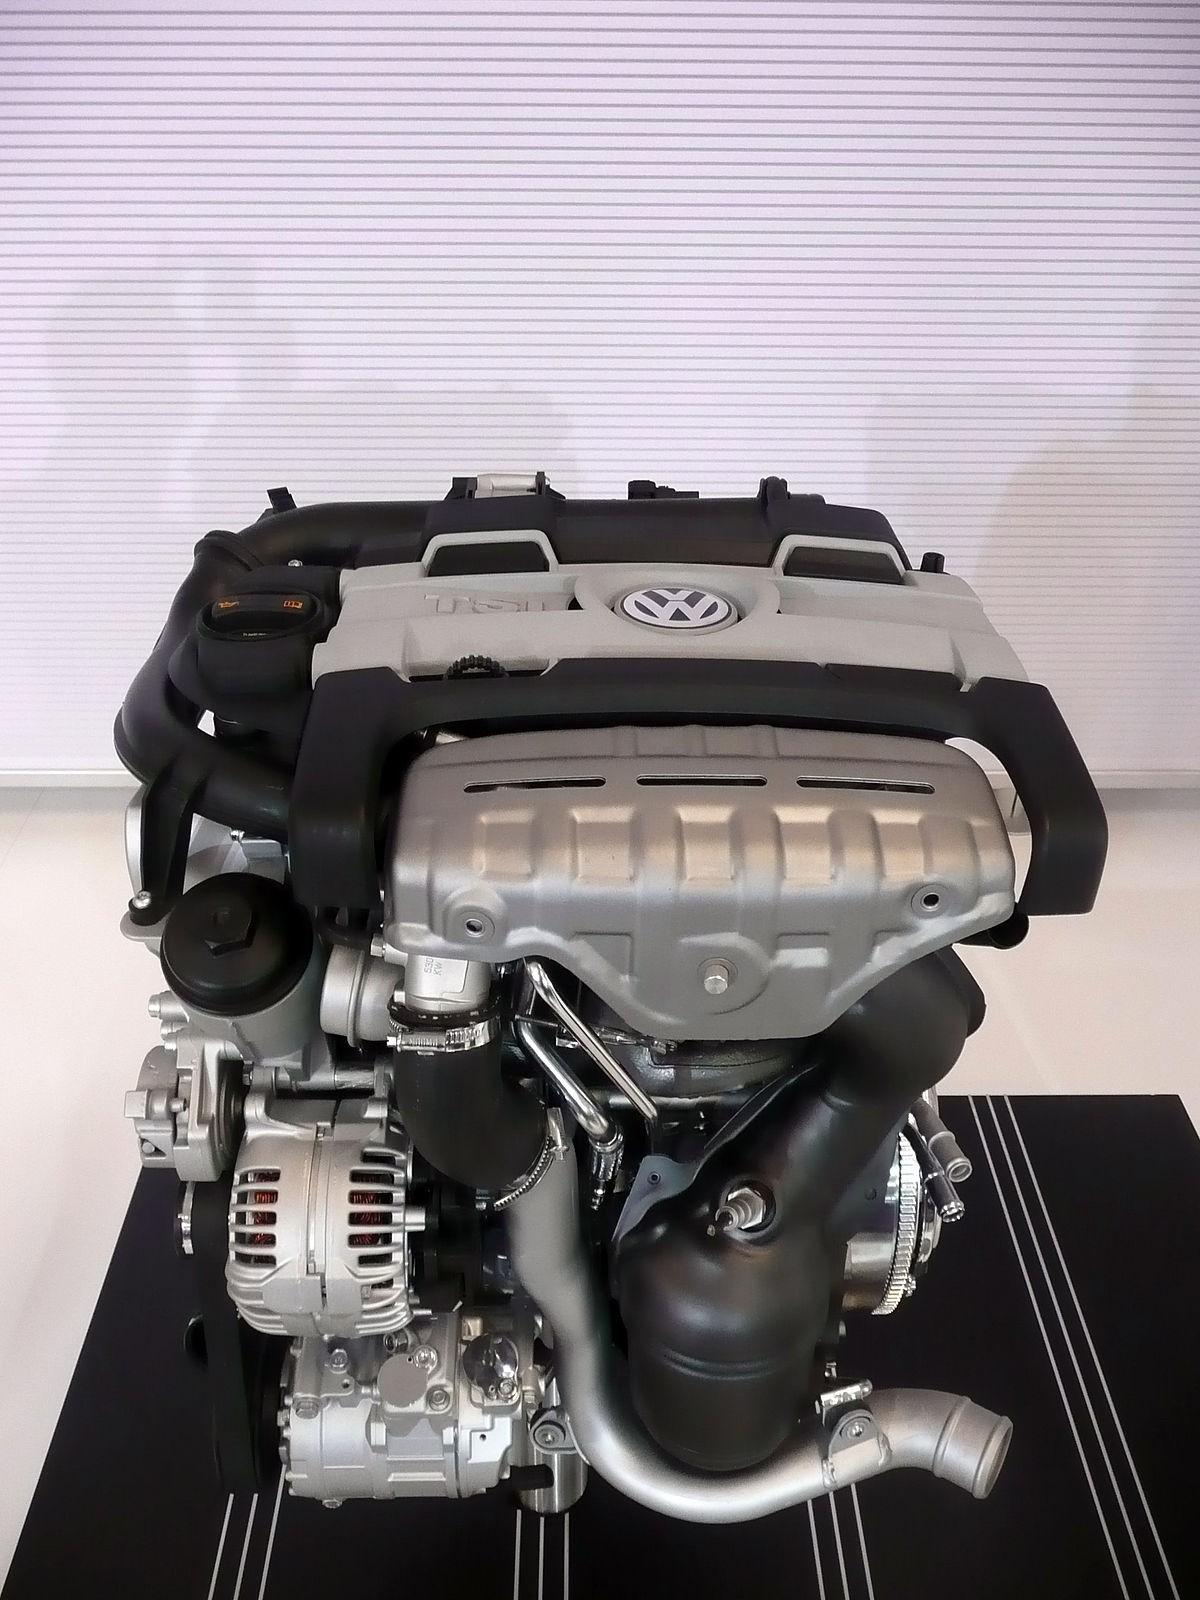 Vw 2 0 Fsi Engine Diagram List Of Volkswagen Group Petrol Engines Of Vw 2 0 Fsi Engine Diagram